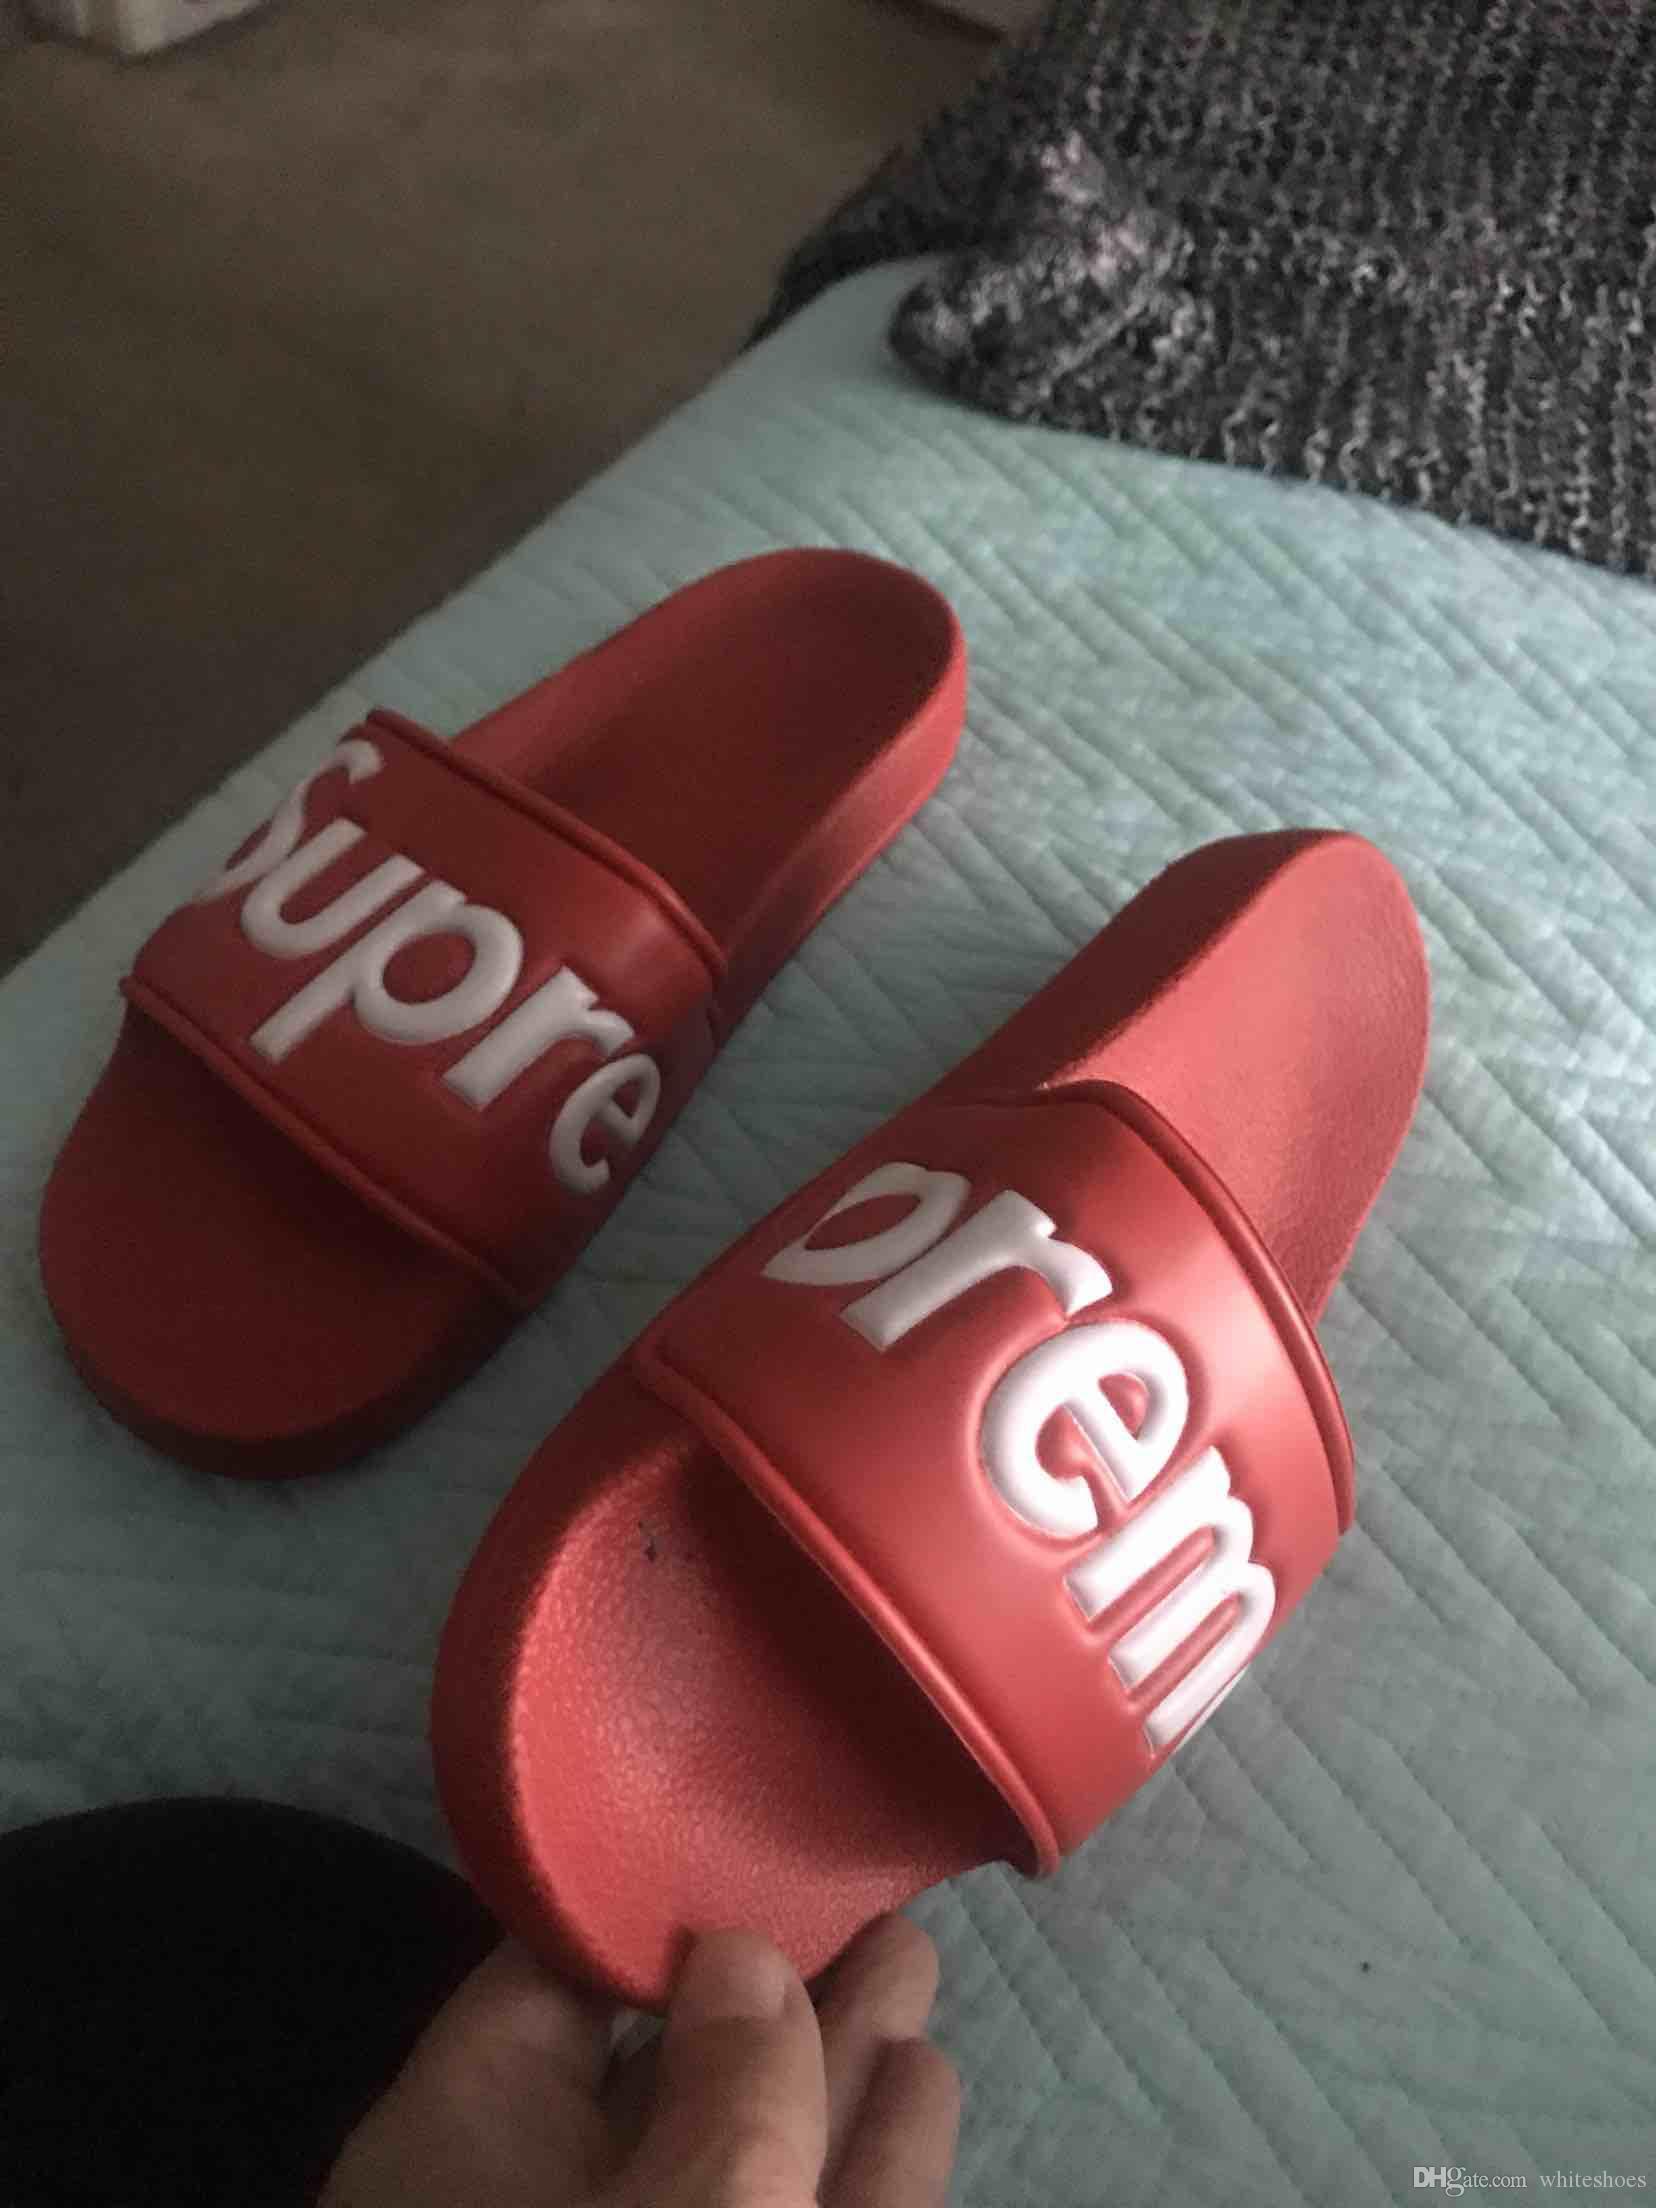 619e3e7a9097 Men Women Sandals Designer Shoes Luxury Slide Summer Fashion Wide Flat  Slippery With Thick Winter Sandals Slipper Flip Flop No Box Desert Boots  Mens ...